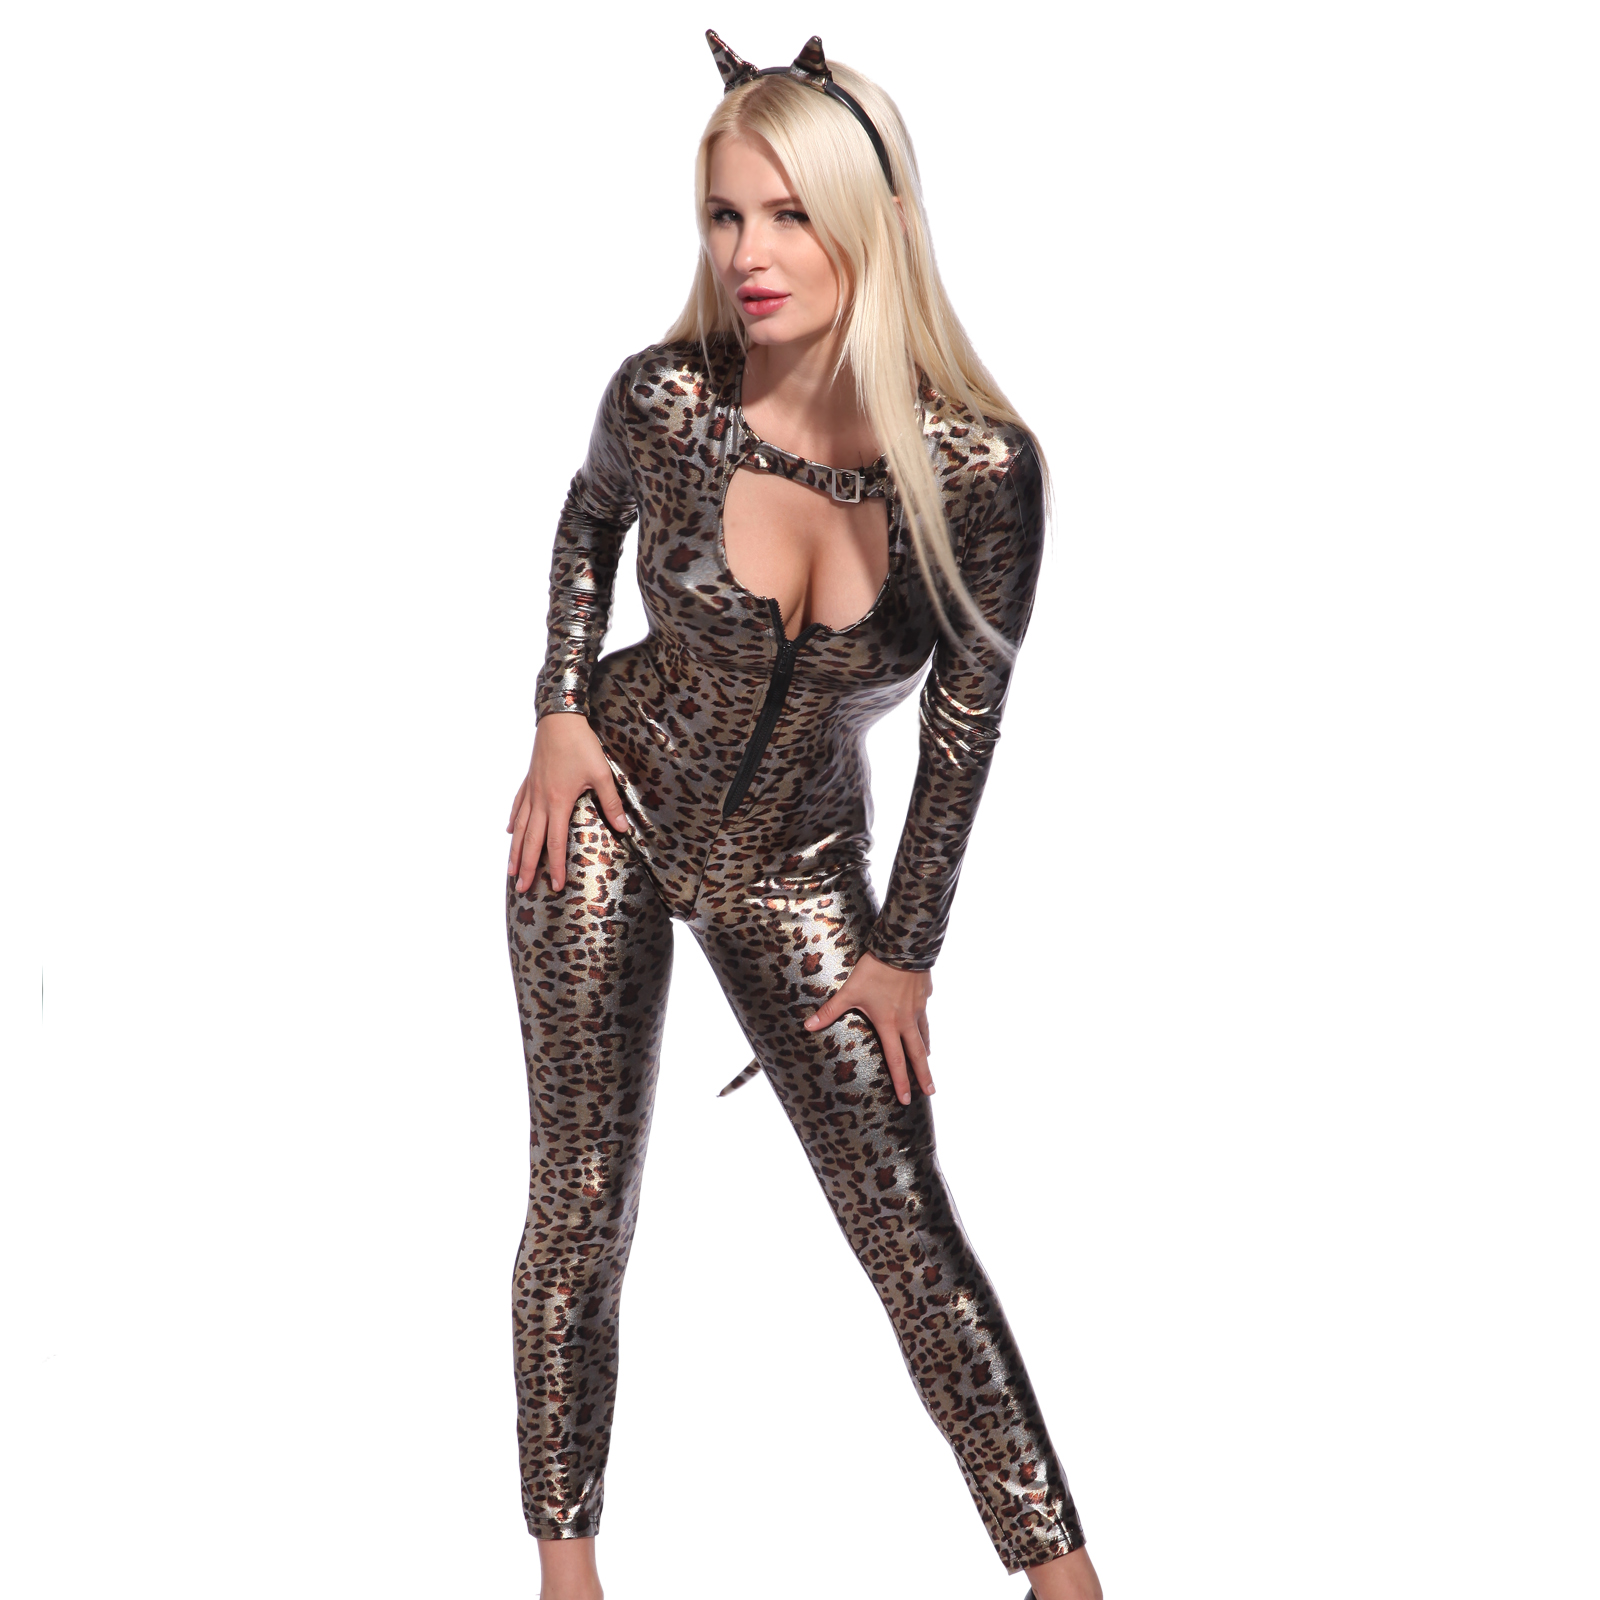 Jan 23, · 출처: I Don't Know.. Enjoy!! Alena in black latex catsuit in a park. Videos from the hottest Latex Fetish Models, Marilyn Yusuf, Kitty Klatsch, Bianca Beauchamp, Jessica SkyHeel, Susan Wayland.